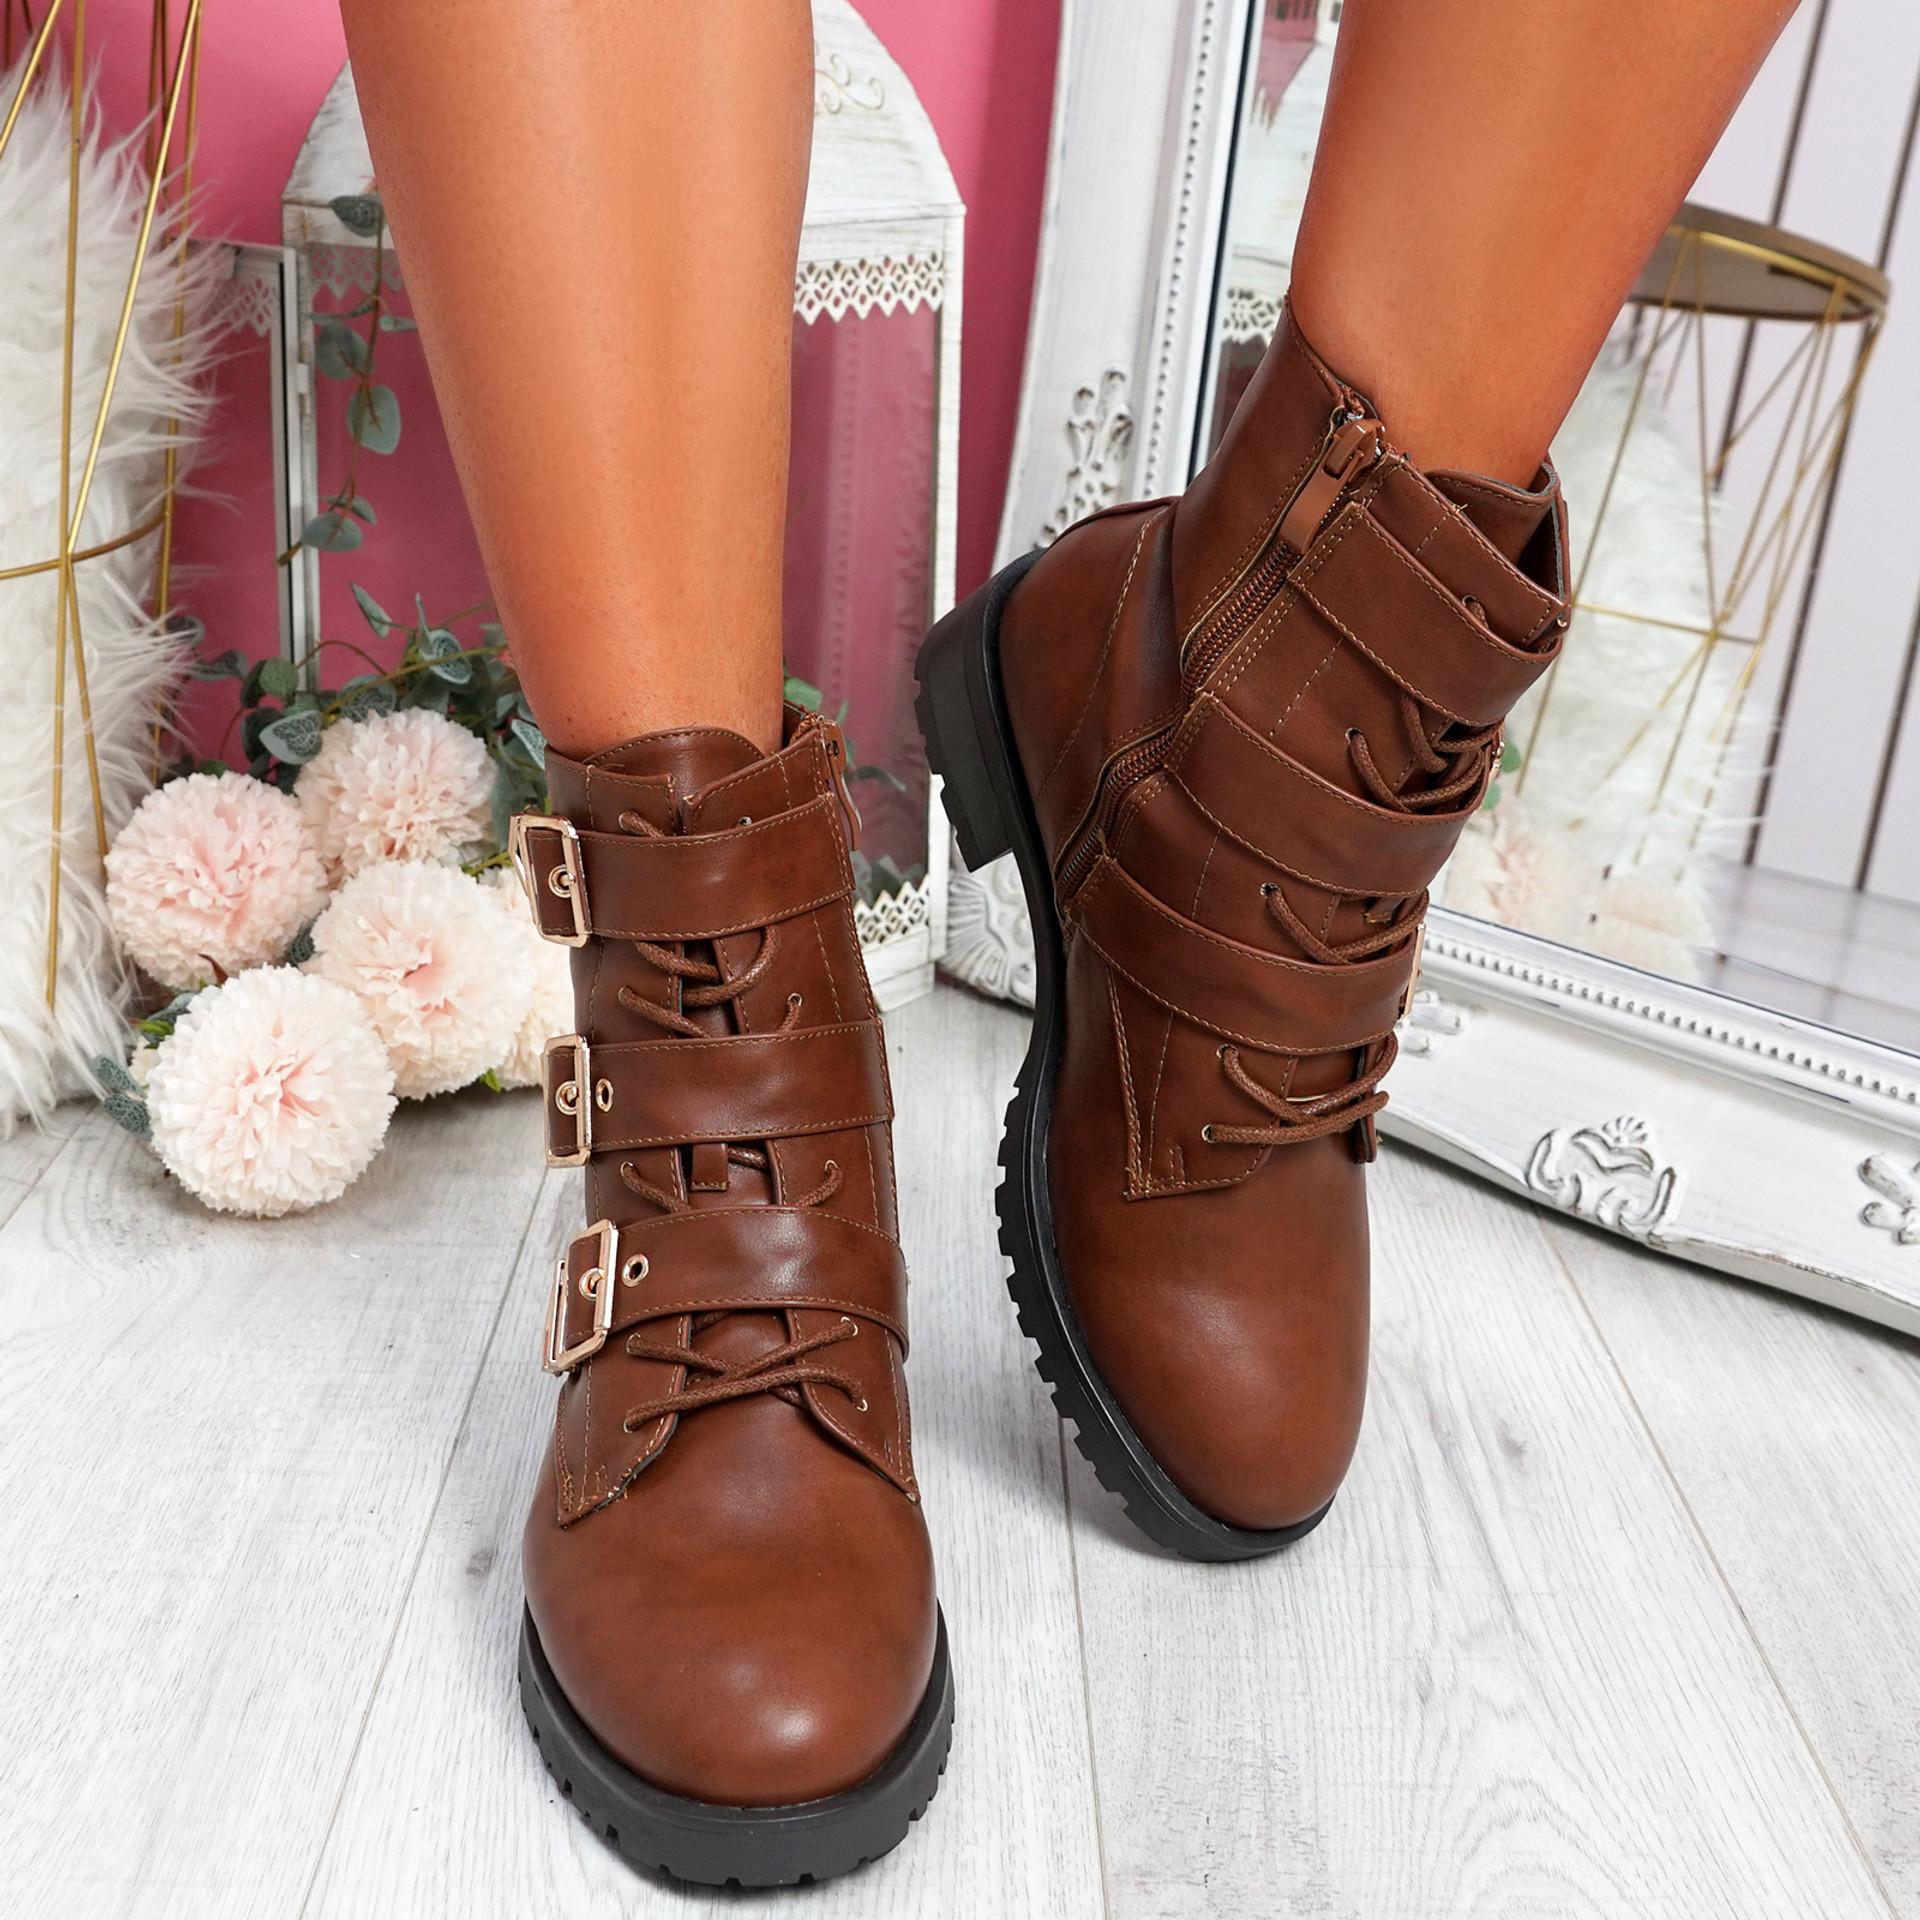 Famma Camel Buckle Zip Ankle Boots